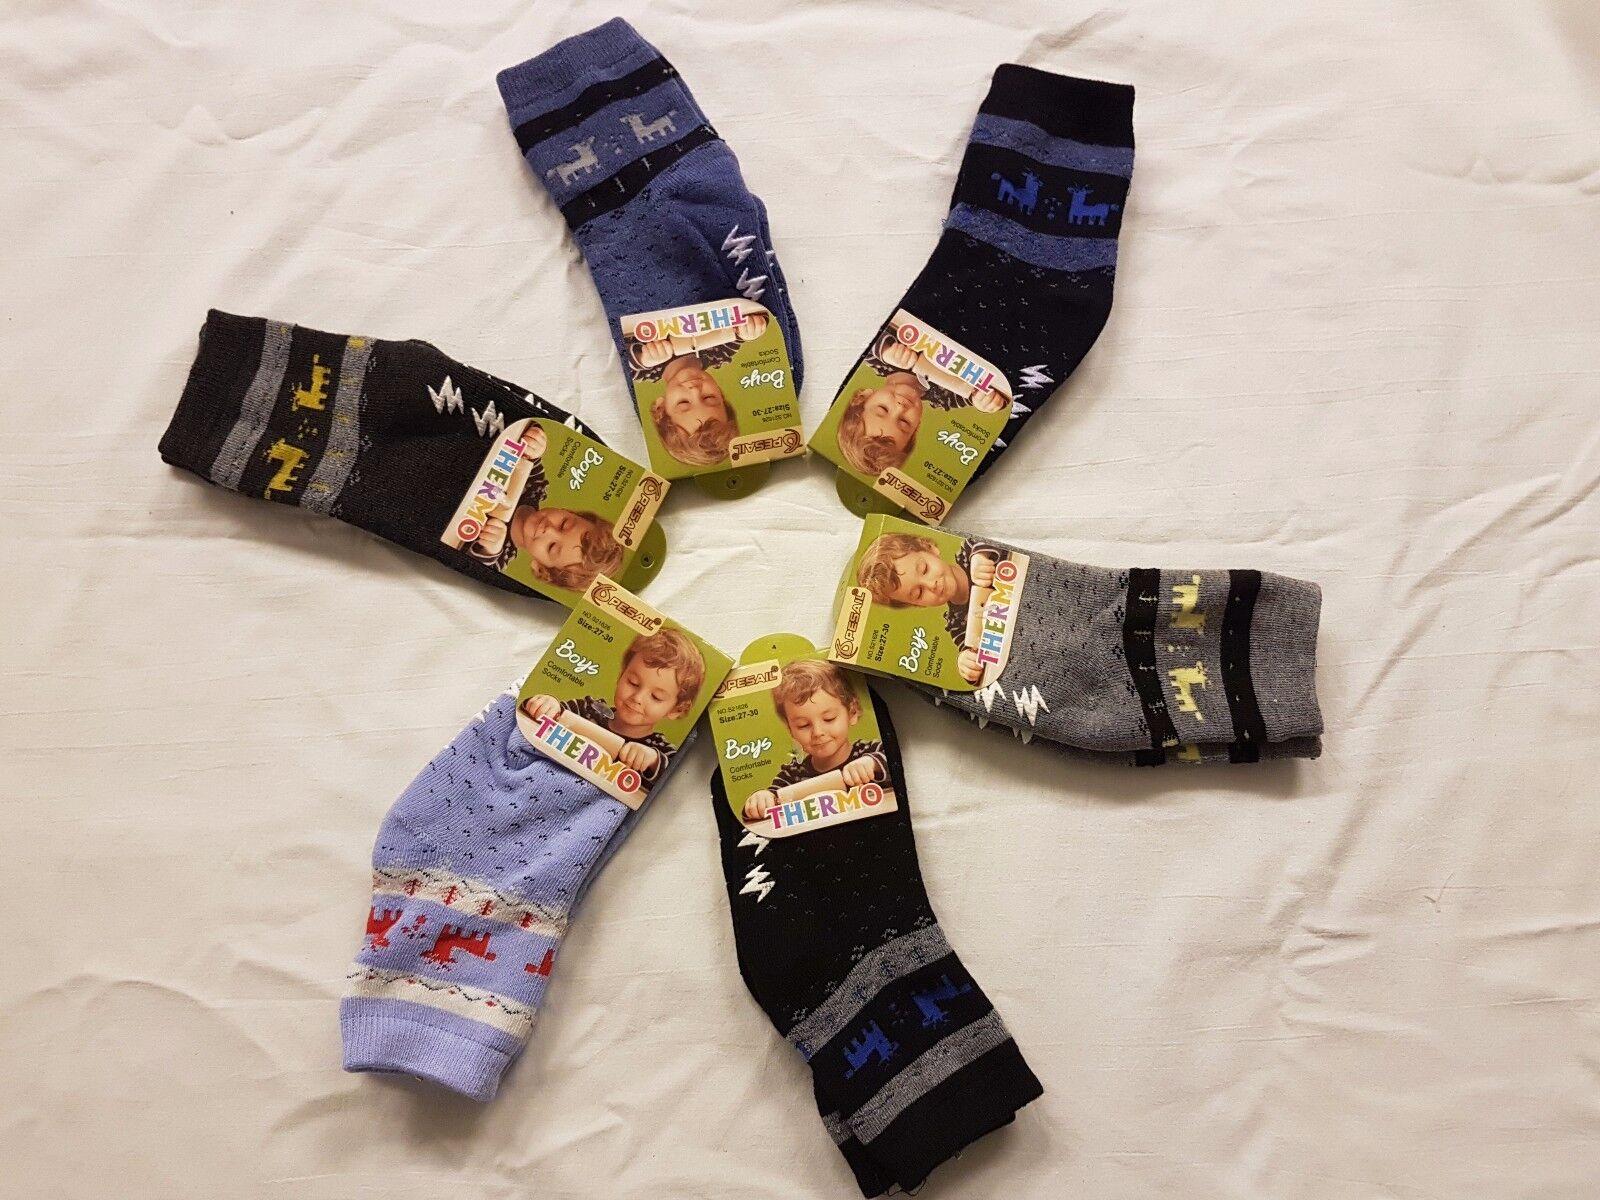 6-12 PAAR KINDER Thermo-Socken ABS-Socken Mädchen/Jungen Gr. 27-30/31-34/35-38